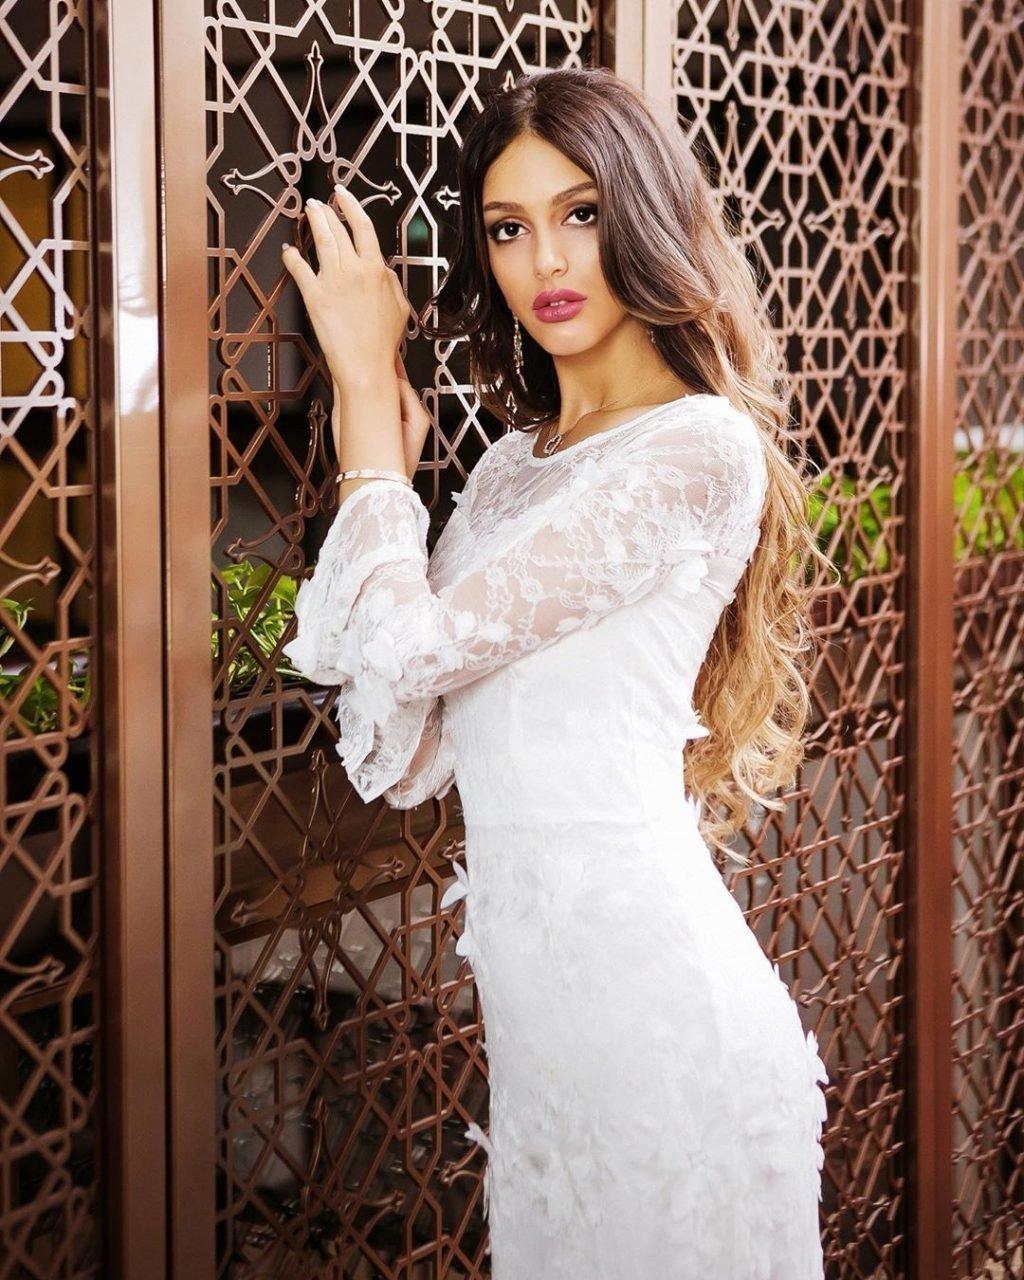 Оксана Воеводина жена короля